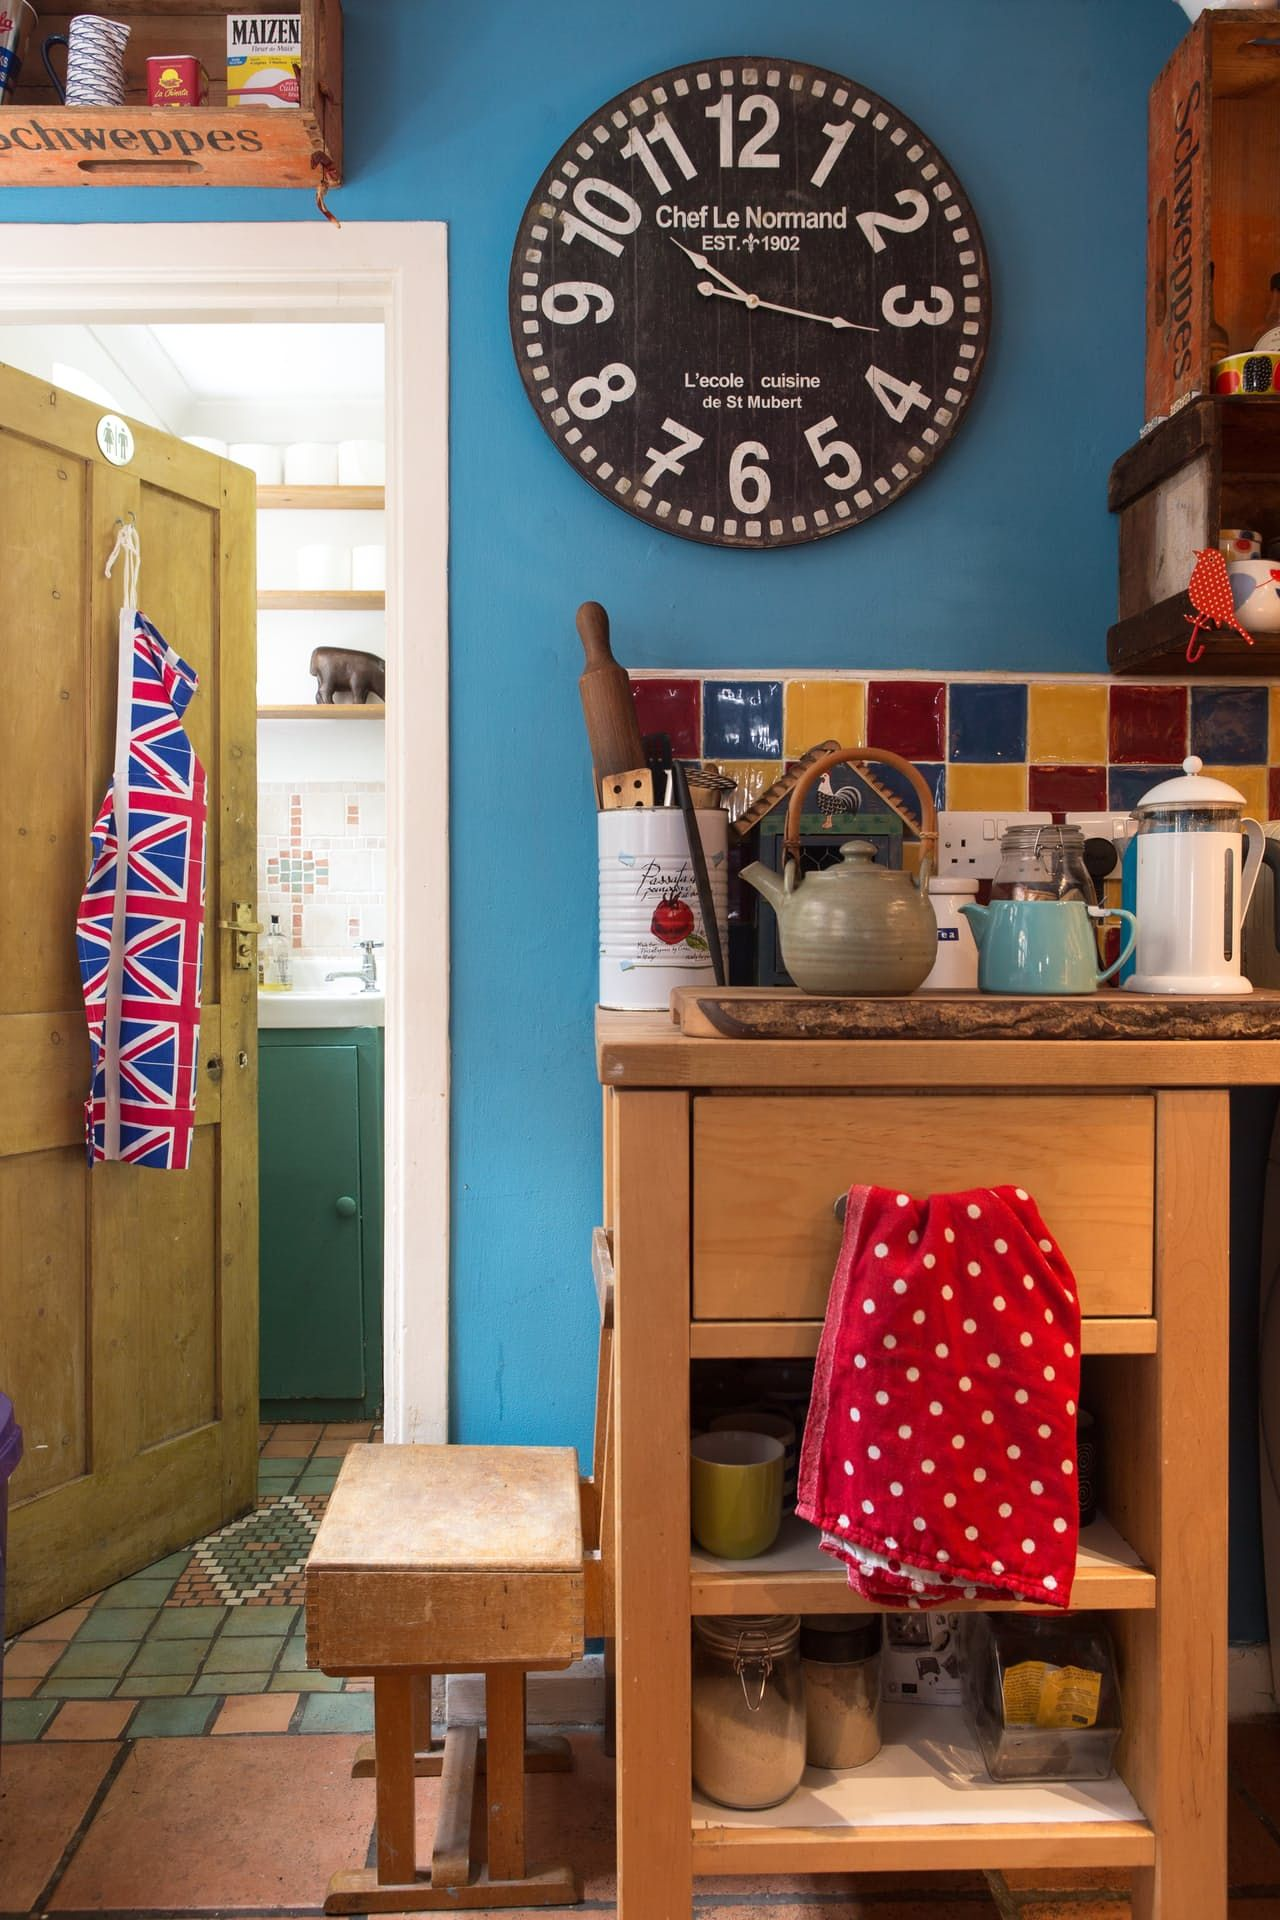 Shauna & John's Post Punk Eclectic English Home and Artist's Studio